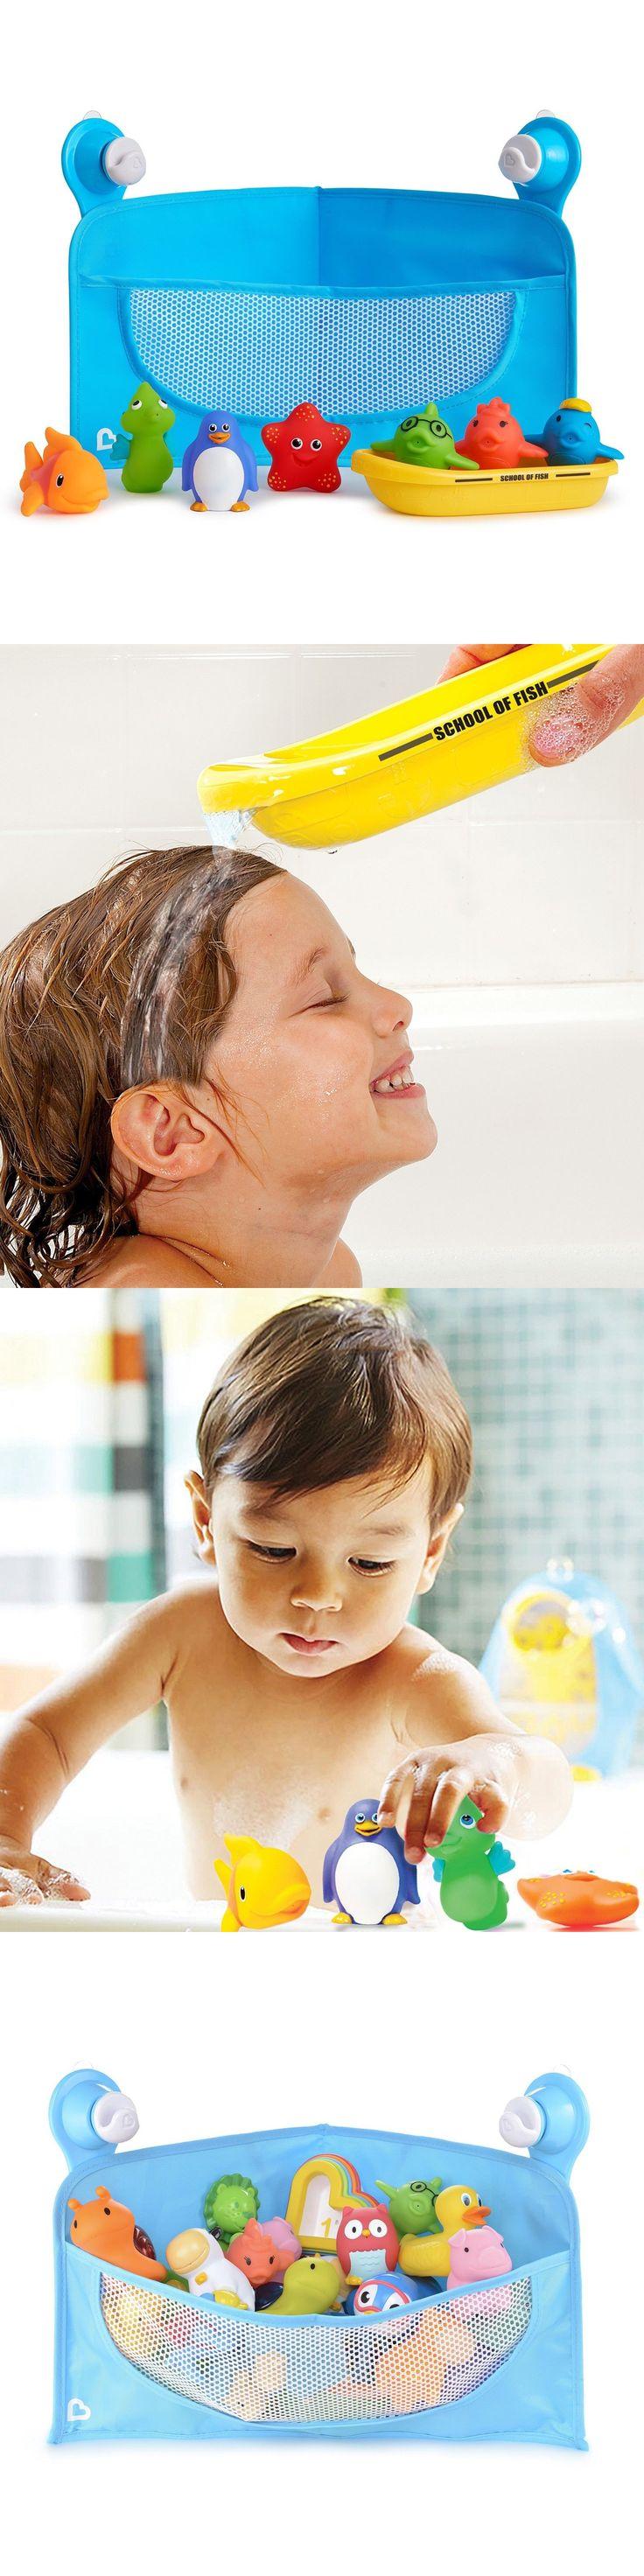 Bath toy storage that transforms to guest luxury bathroom on - The 25 Best Bath Toy Storage Ideas On Pinterest Kids Bath Toys Kids Storage And Storage For Kids Toys